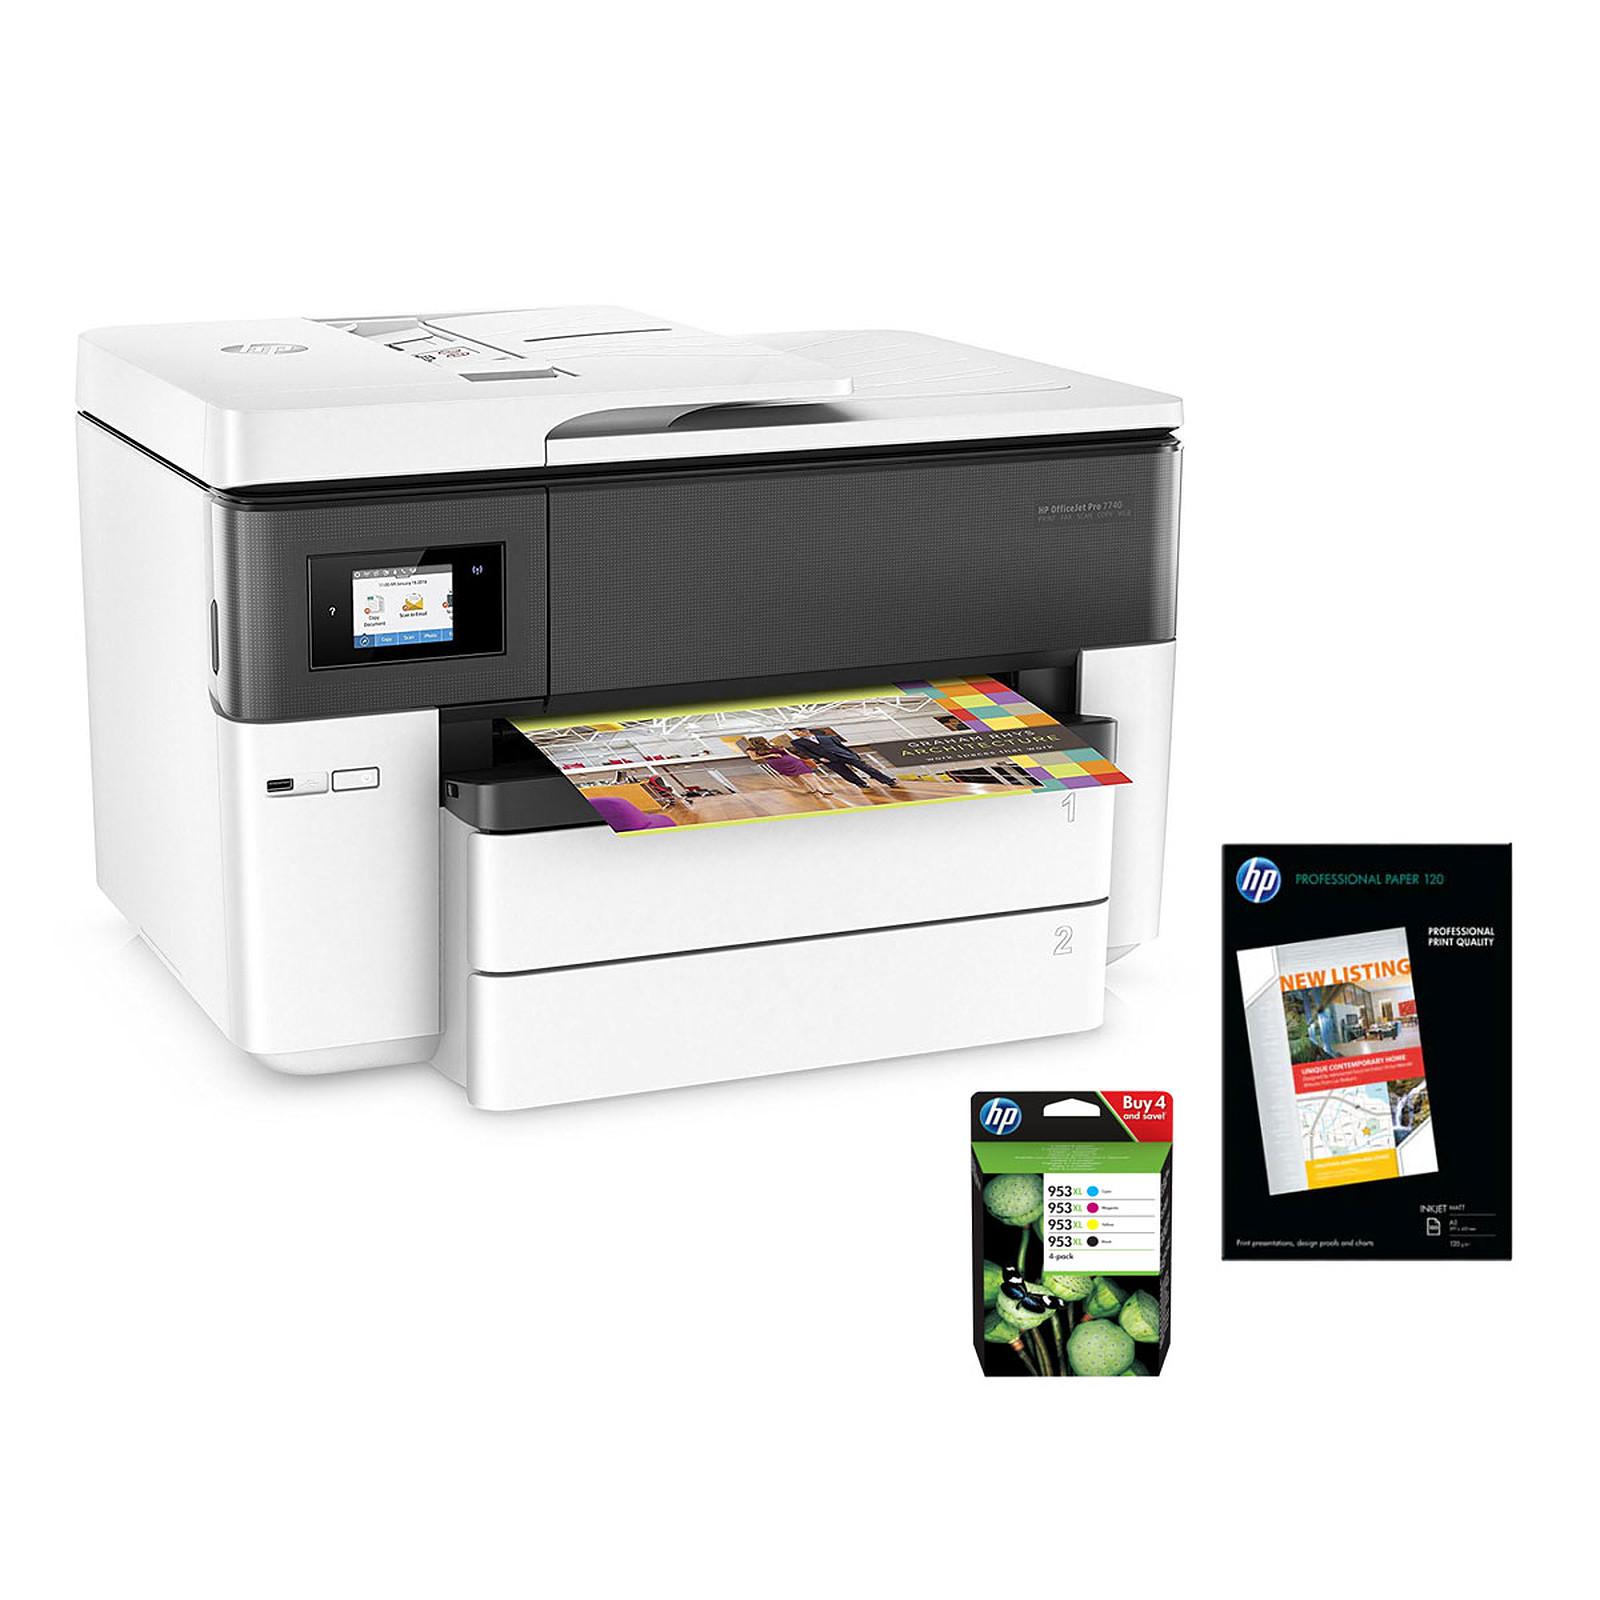 HP OfficeJet Pro 7740 + Papier mat + Pack 4 cartouches